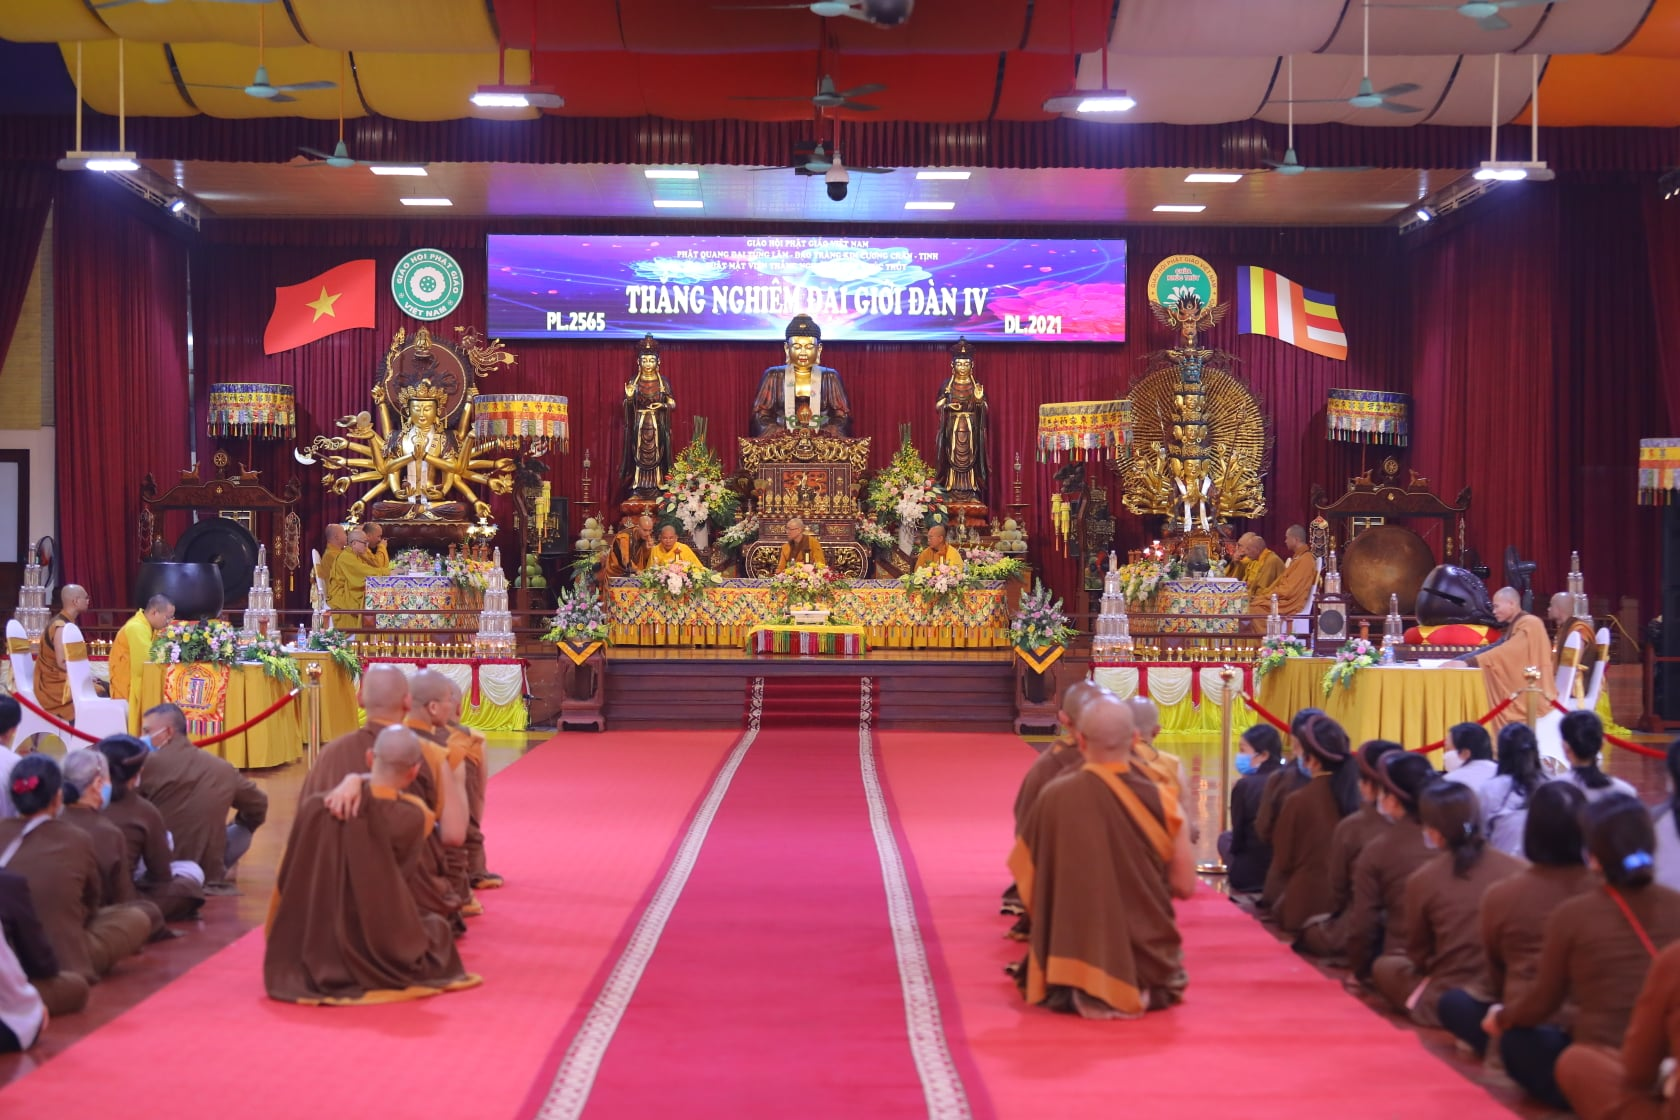 Thang Nghiem Dai Gioi Dan IV (64)